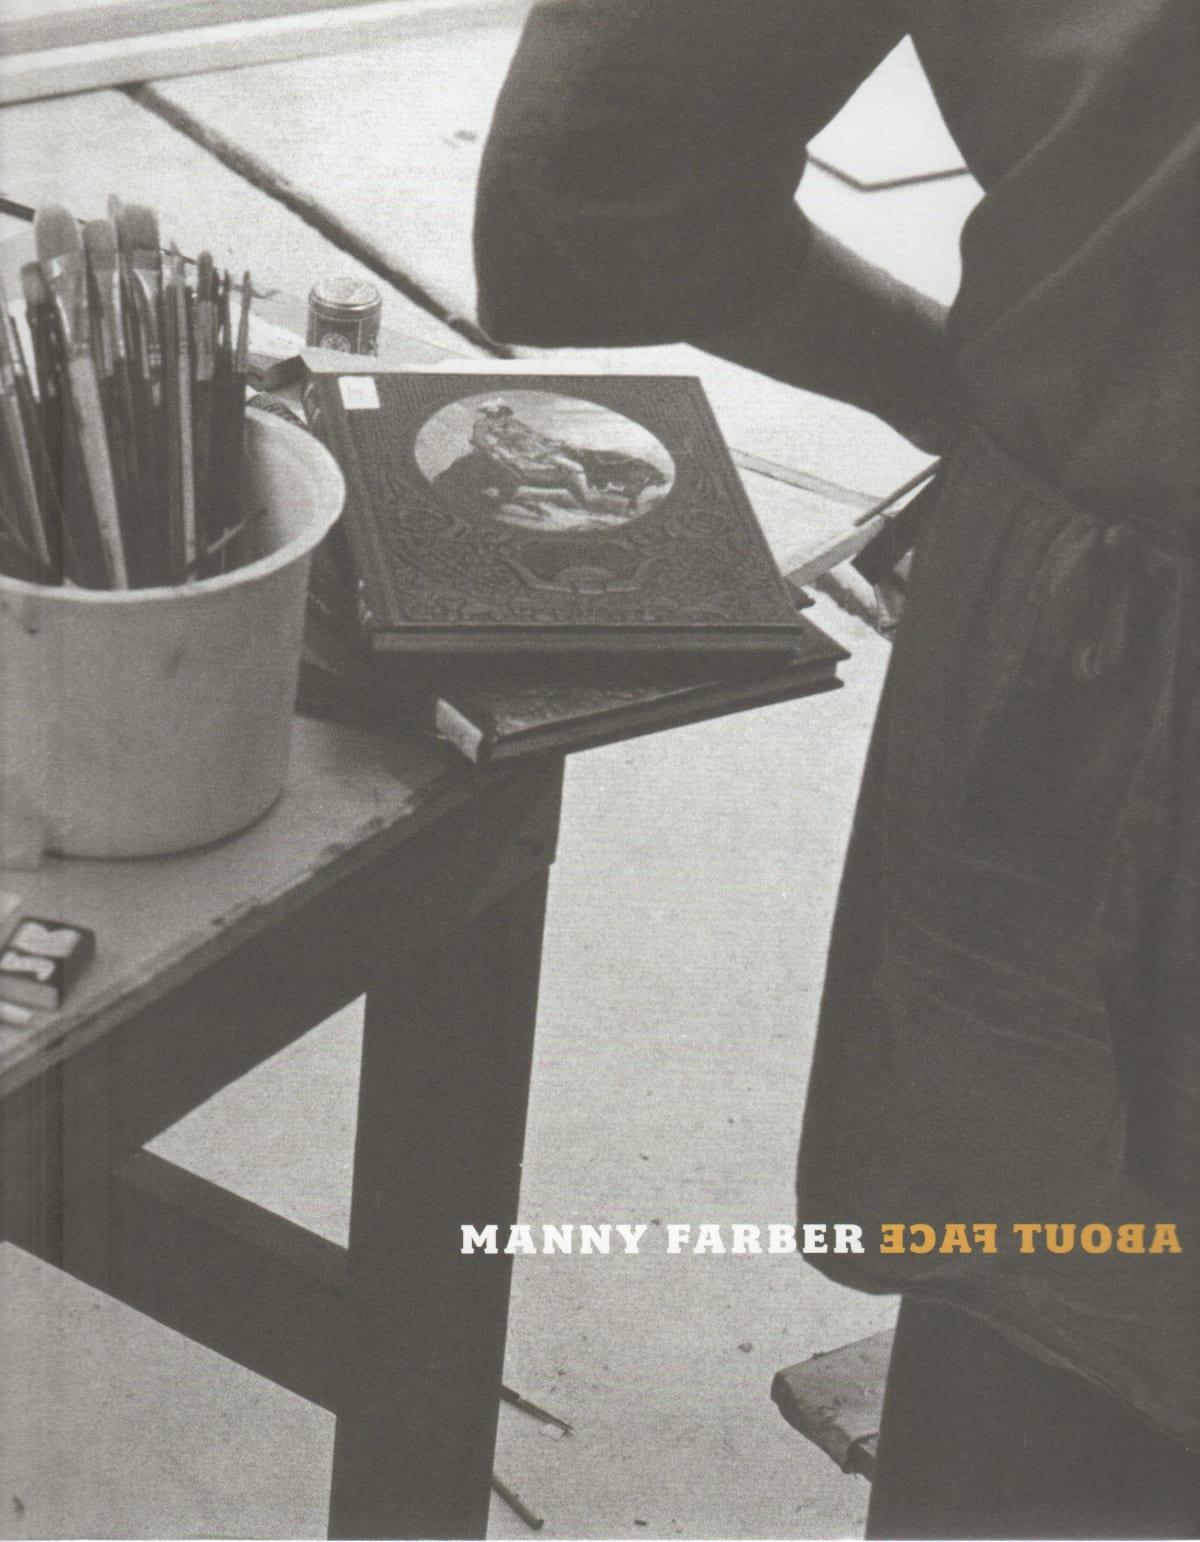 Manny Farber